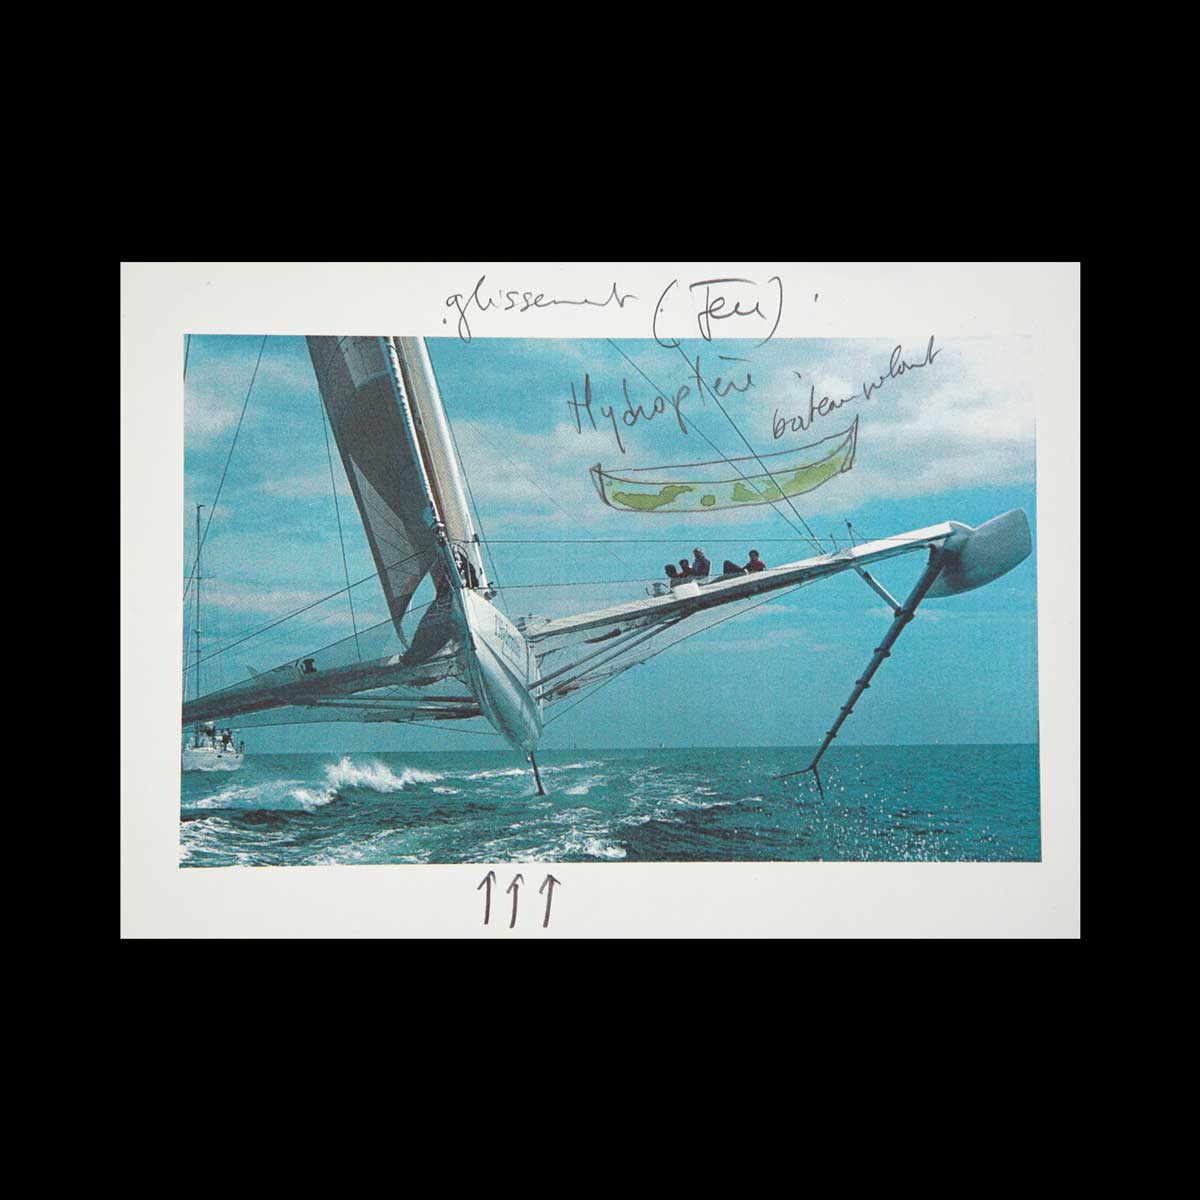 fabrice-hyber-eau-d-or-eau-dort-odor-1997-ur-editions-3